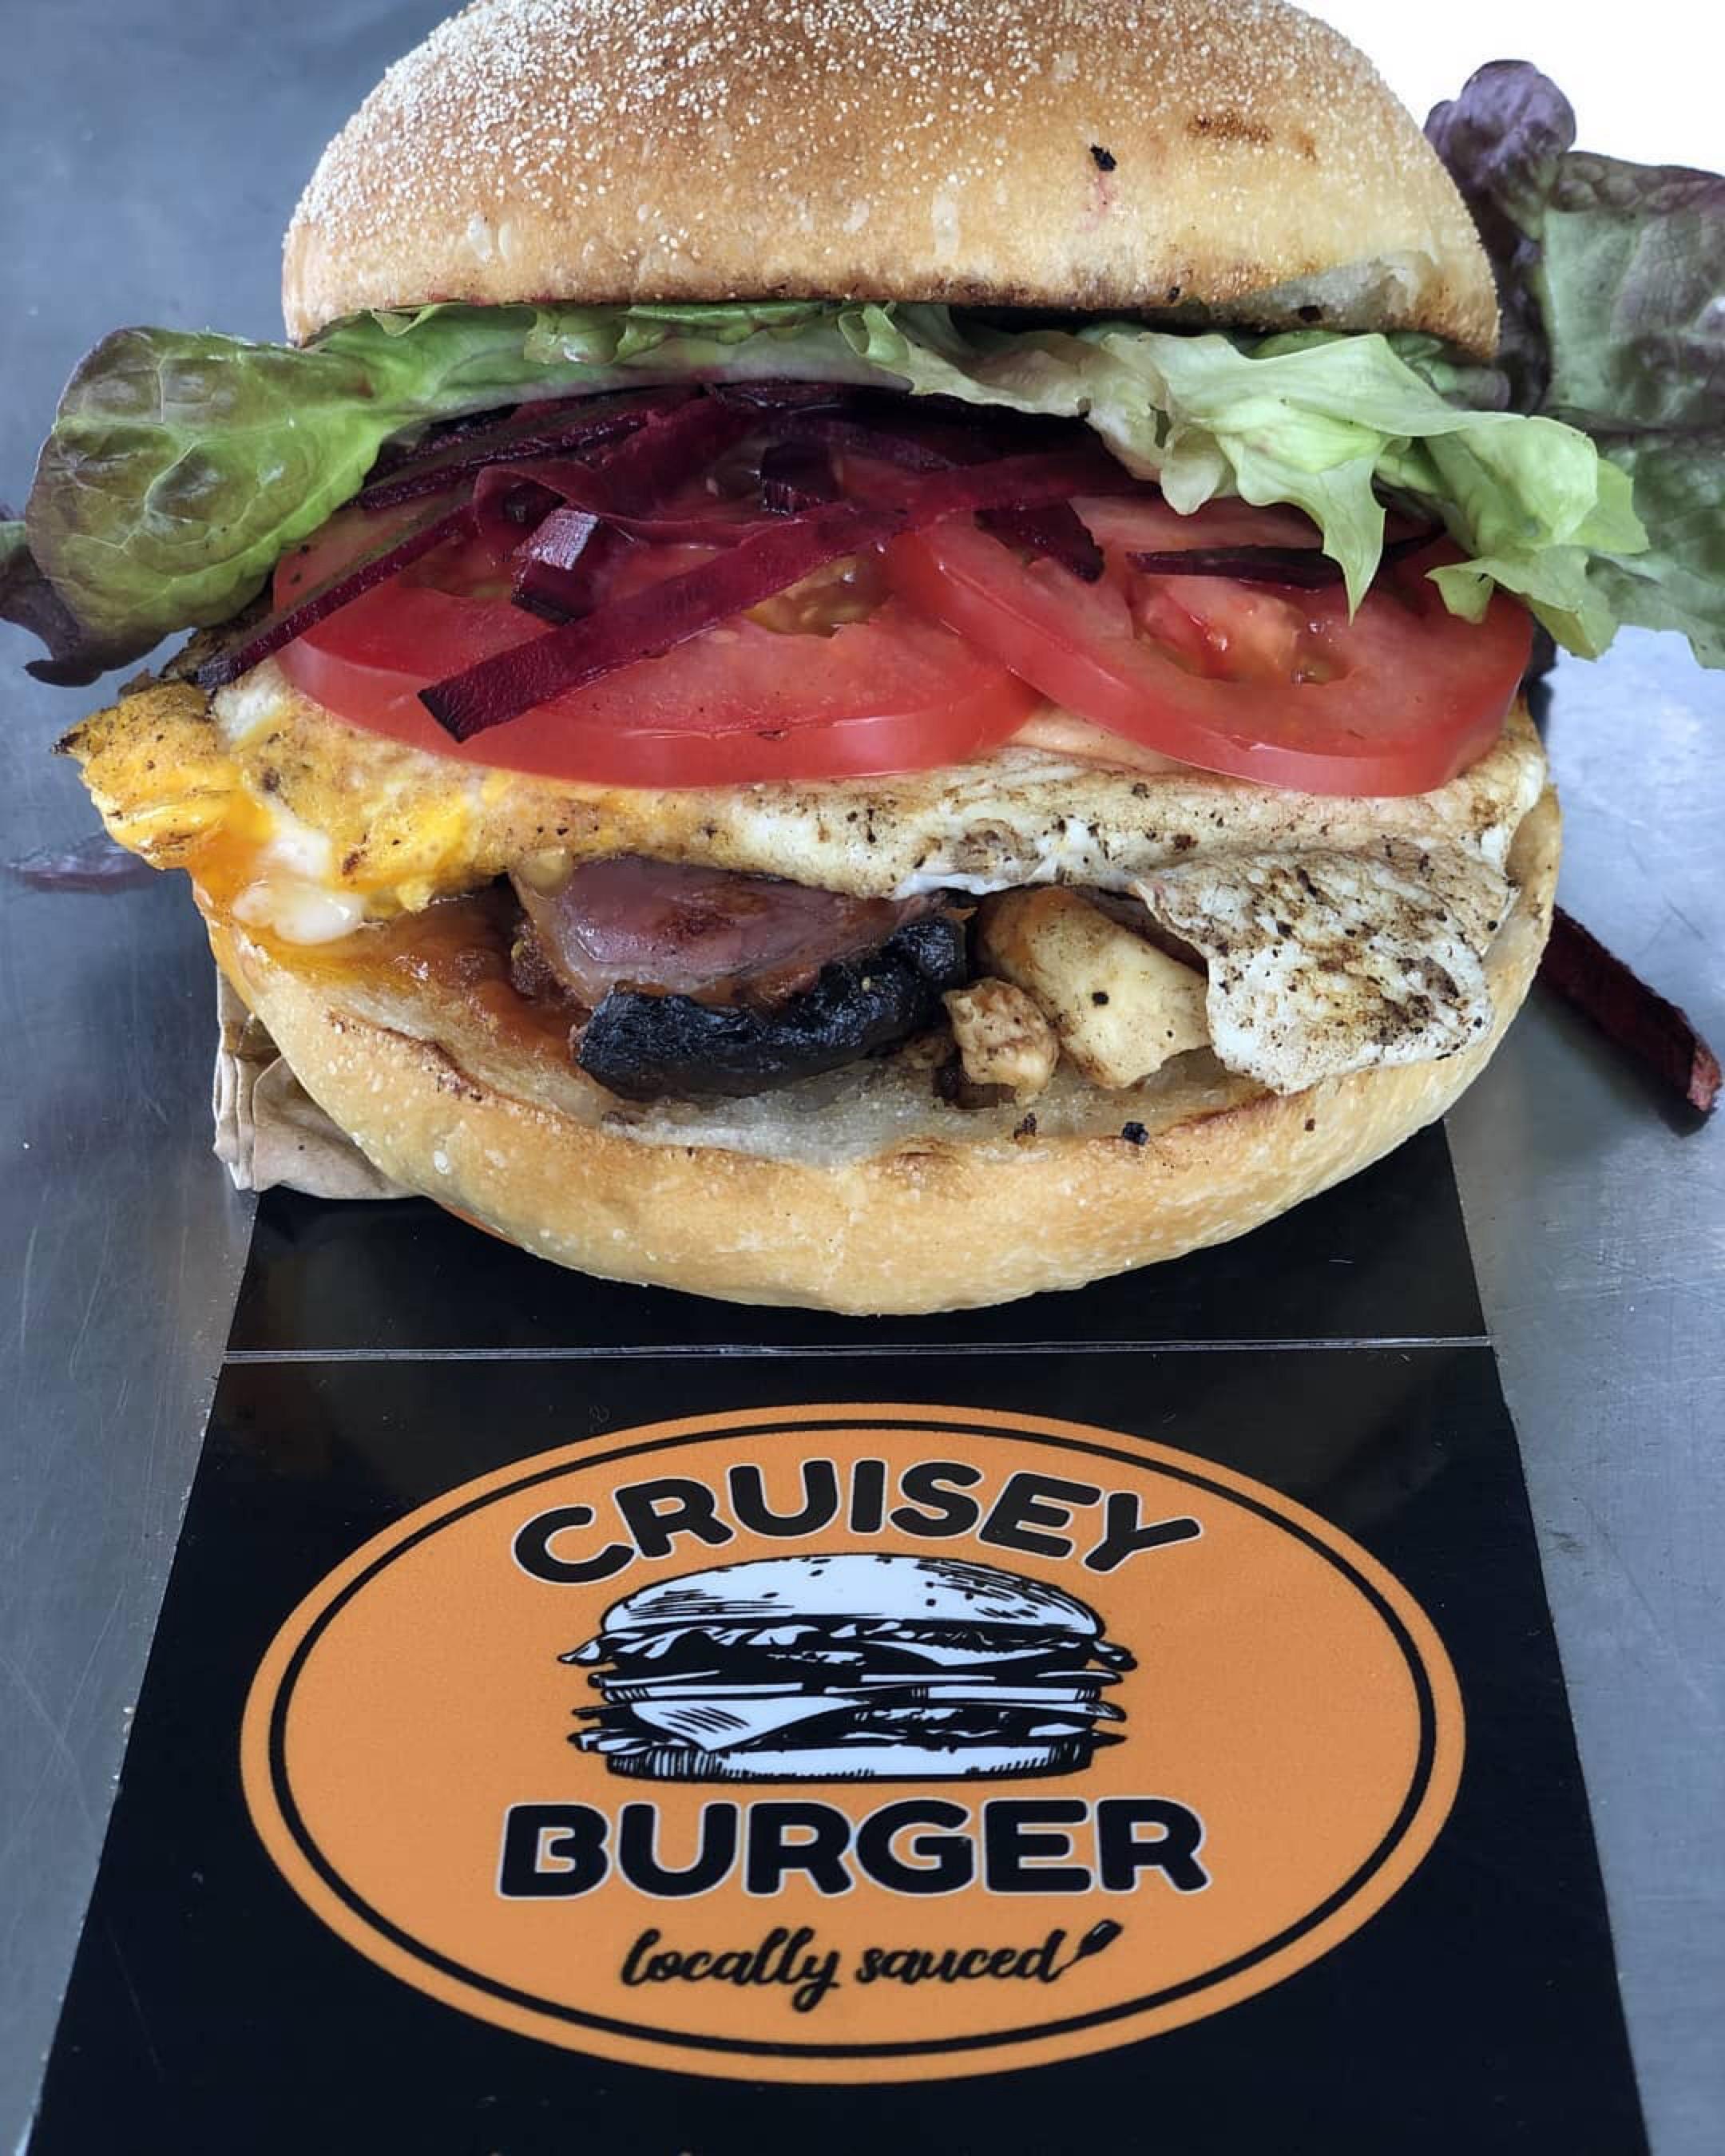 Cruisey Burger -